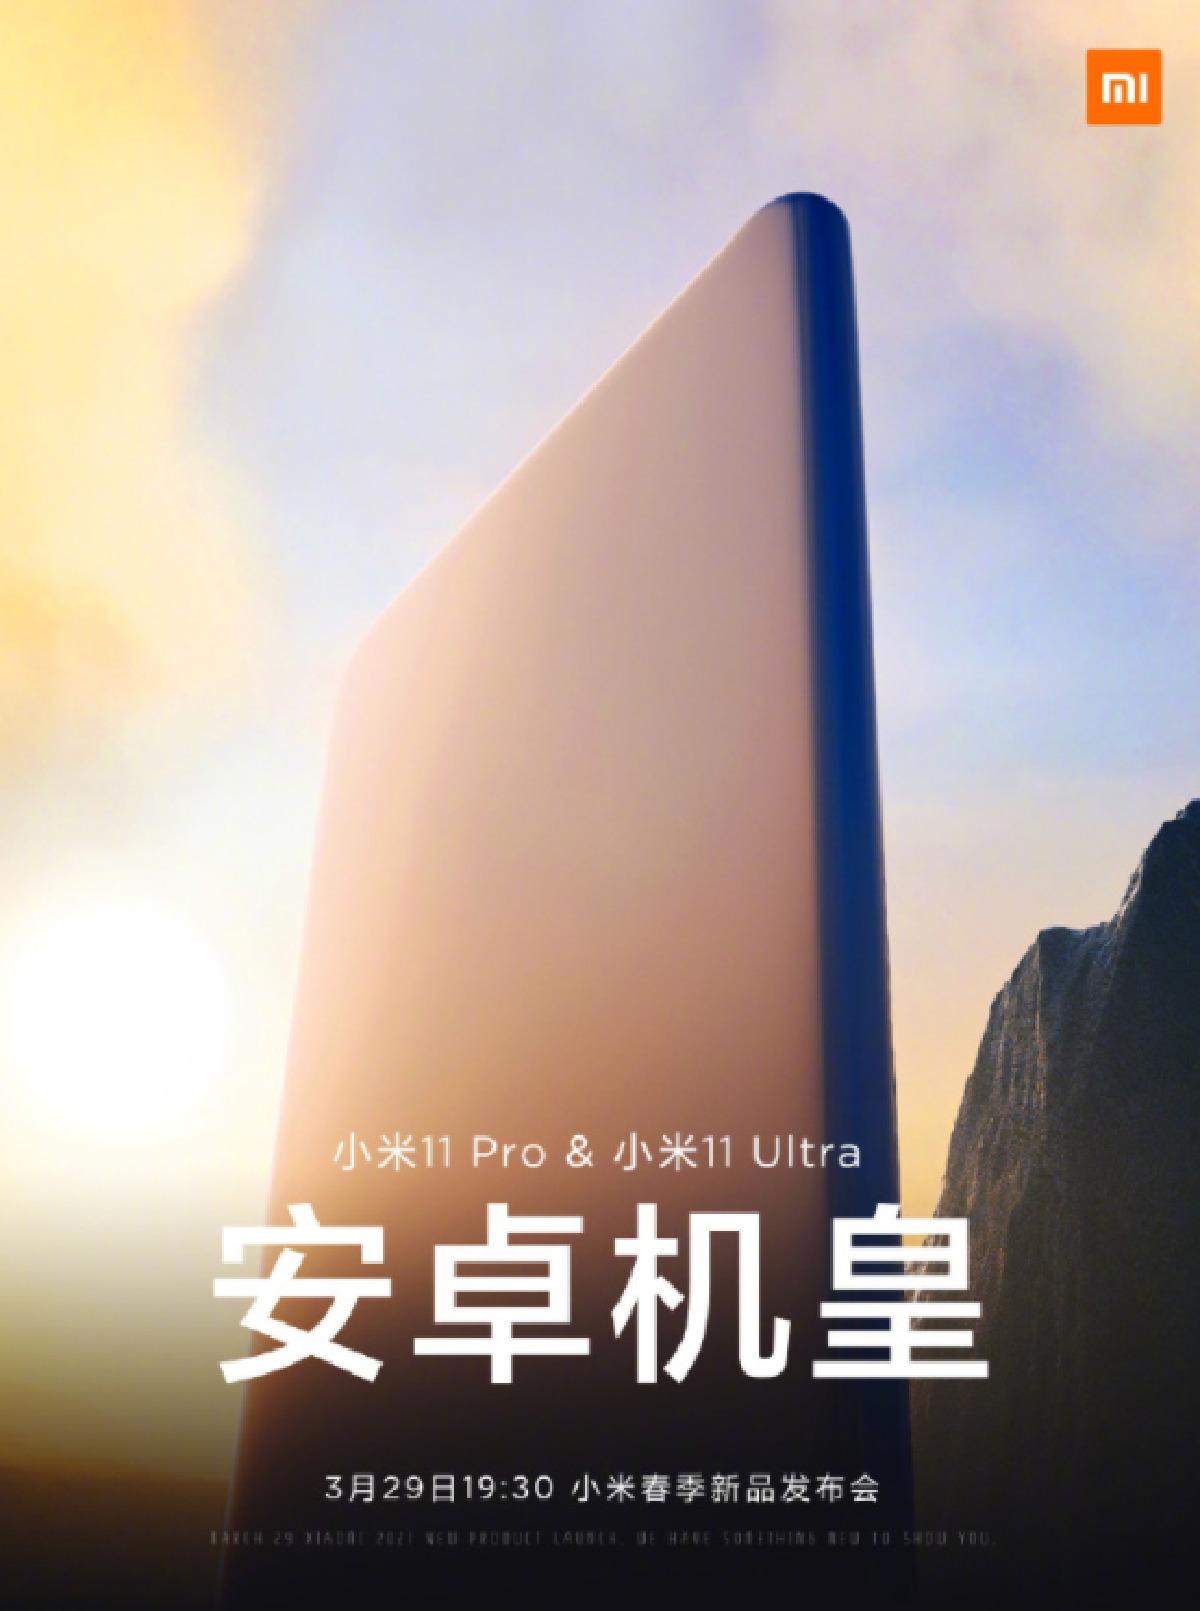 Xiaomi Mi 11 Pro et Mi 11Ultra: fin du suspens, voici leur date de présentation